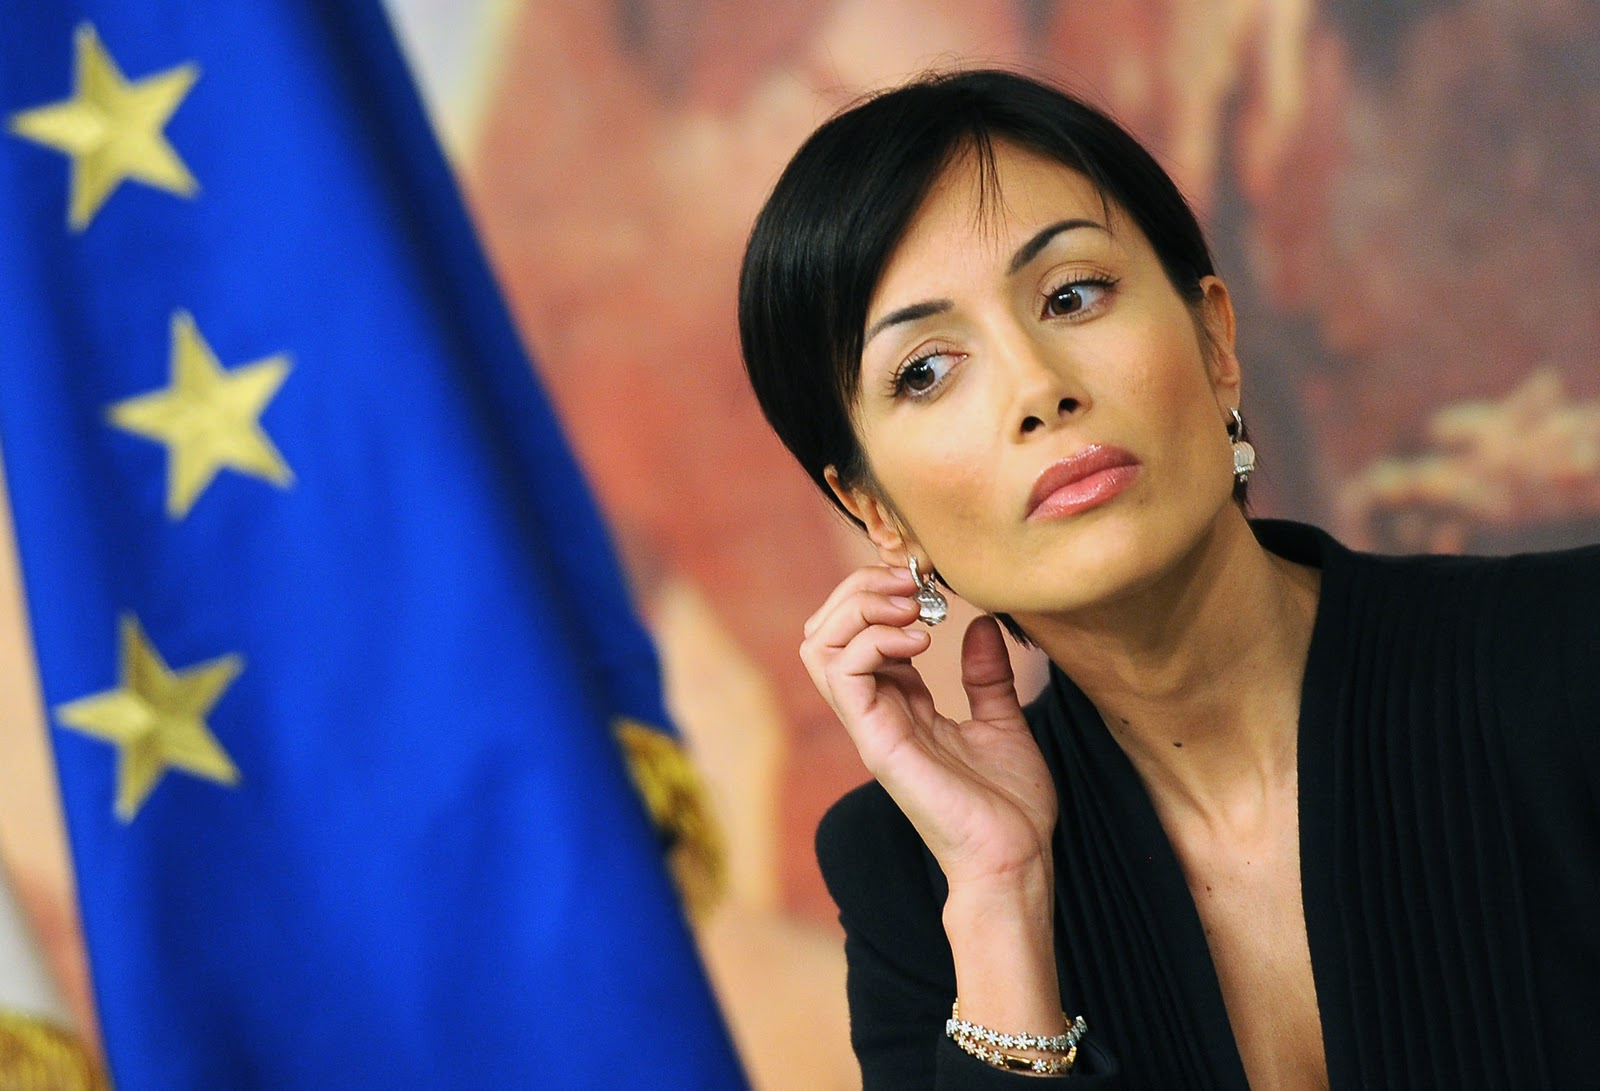 Italienische Politikerin